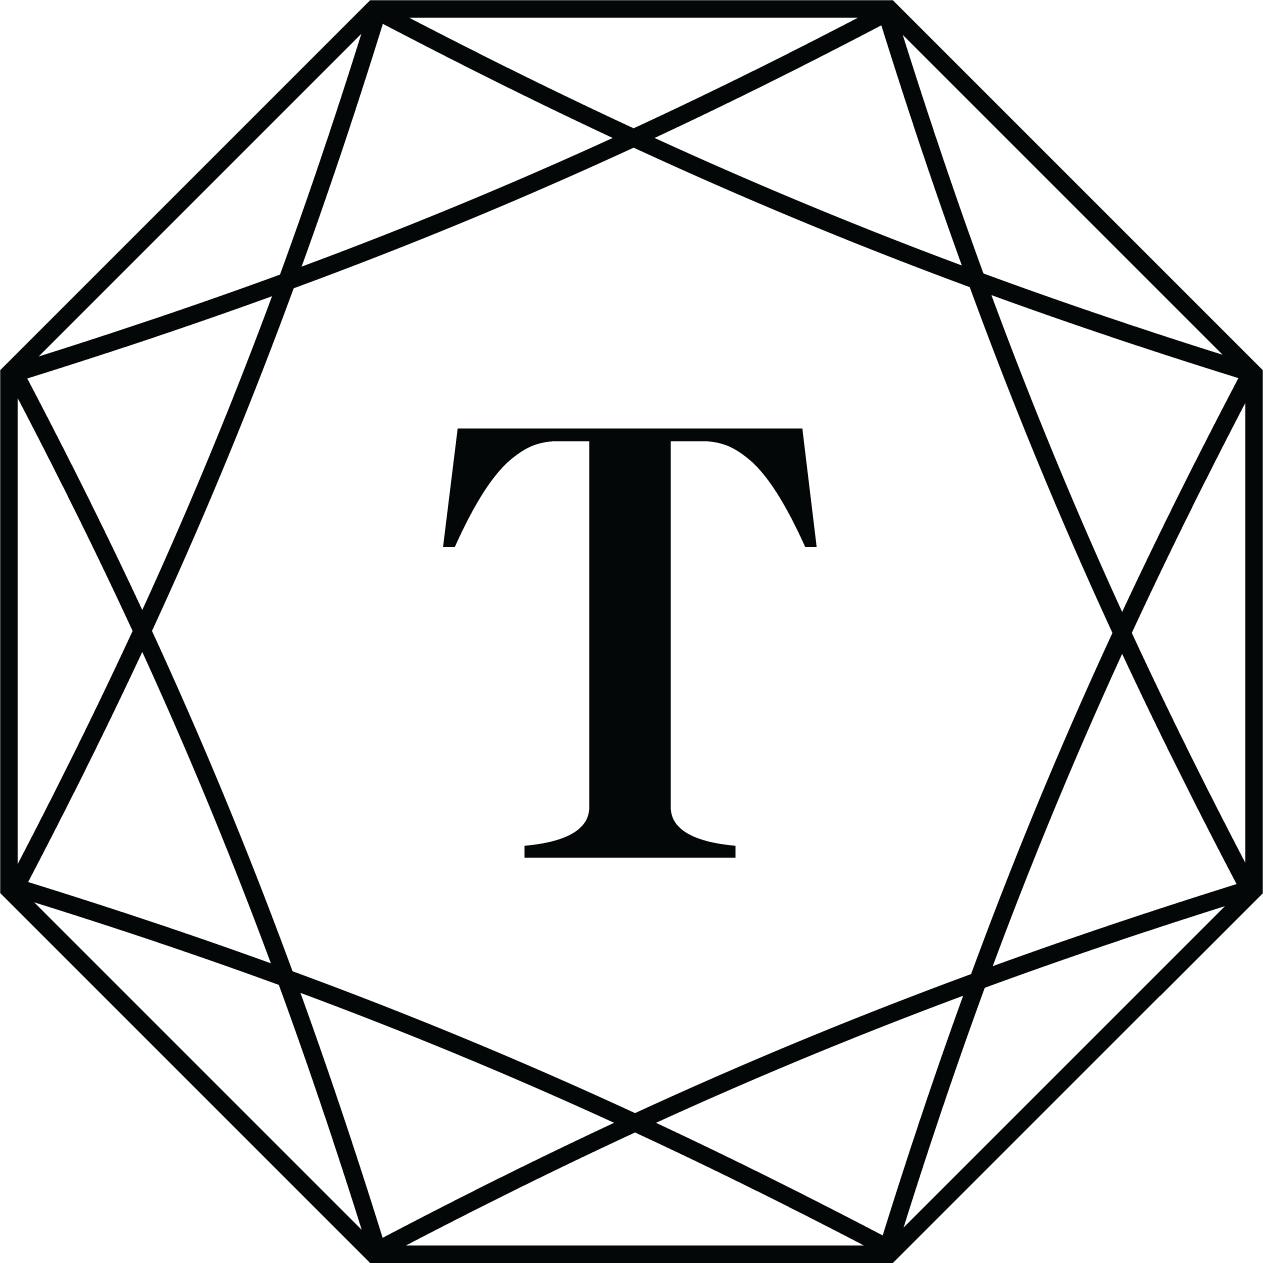 Tradesy - Software Engineer, Data